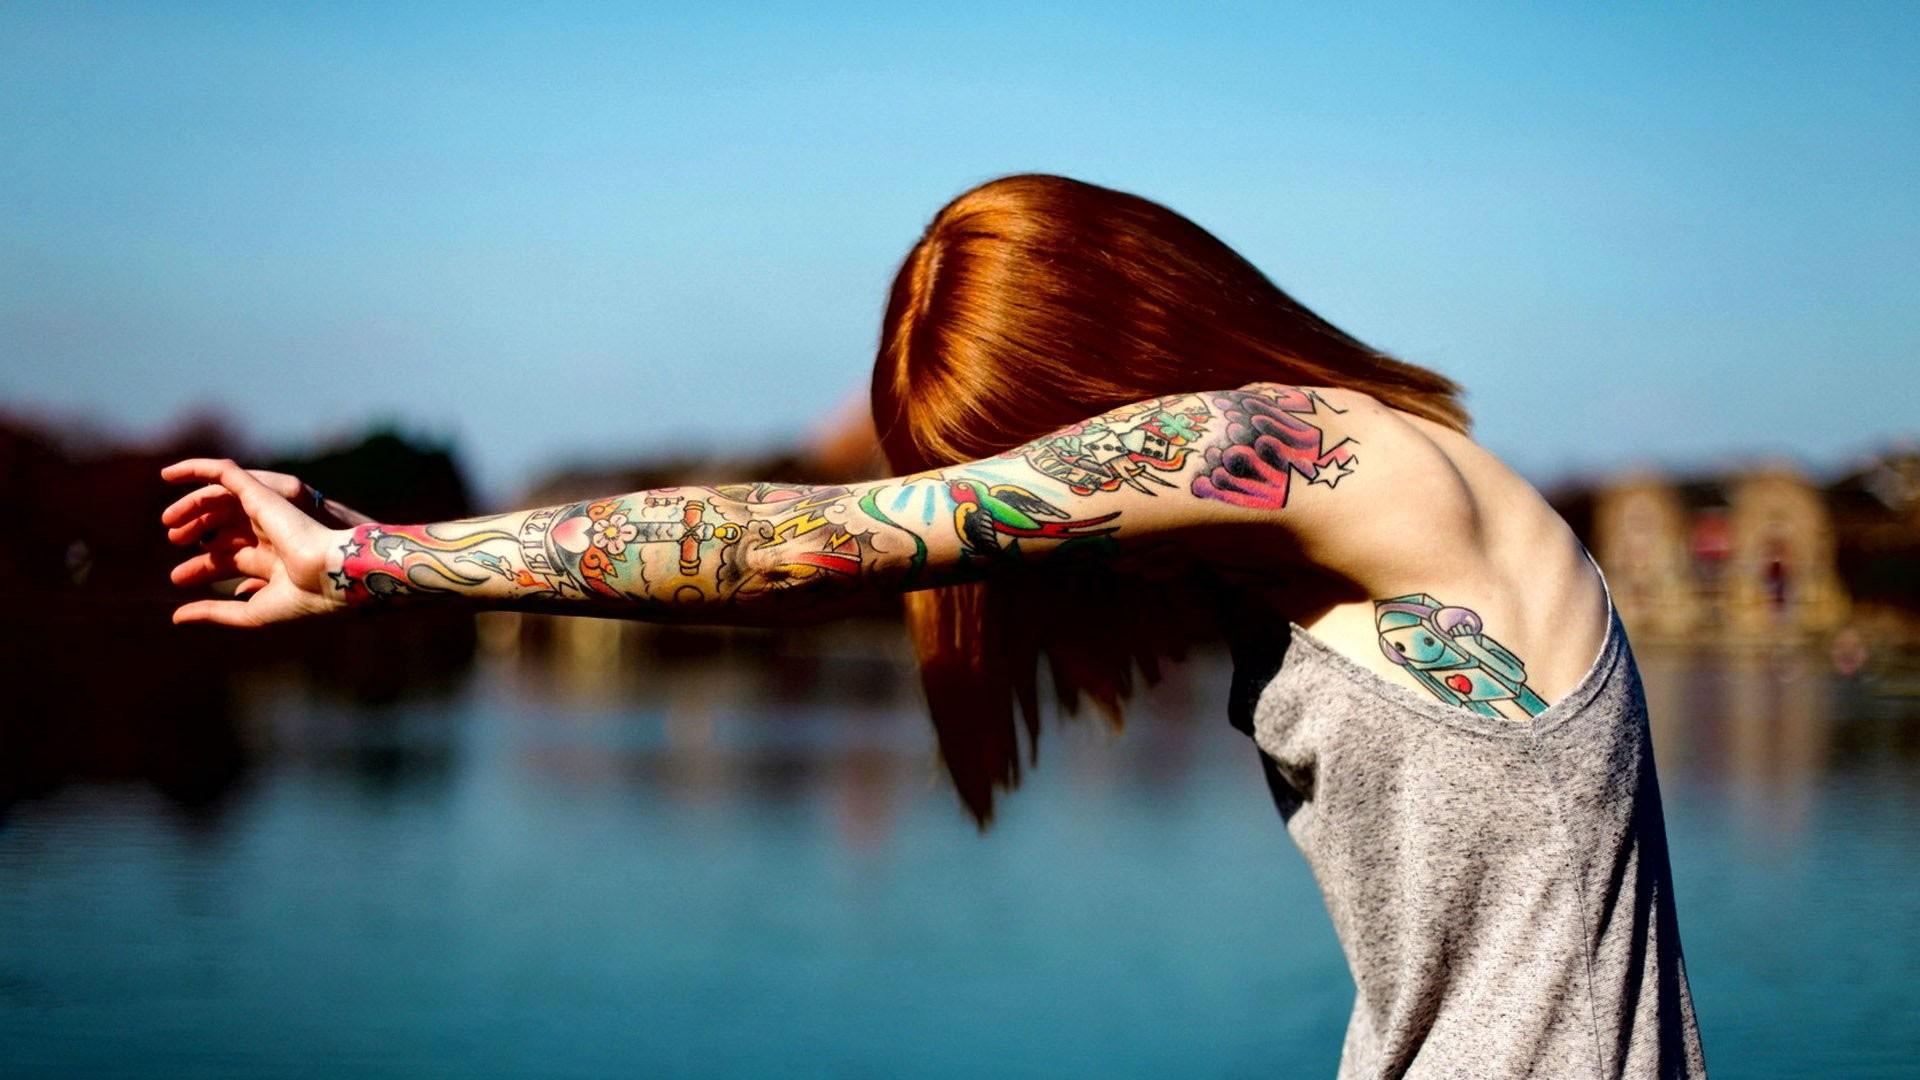 Hd Wallpapers Tattoo Fondos De Pantalla